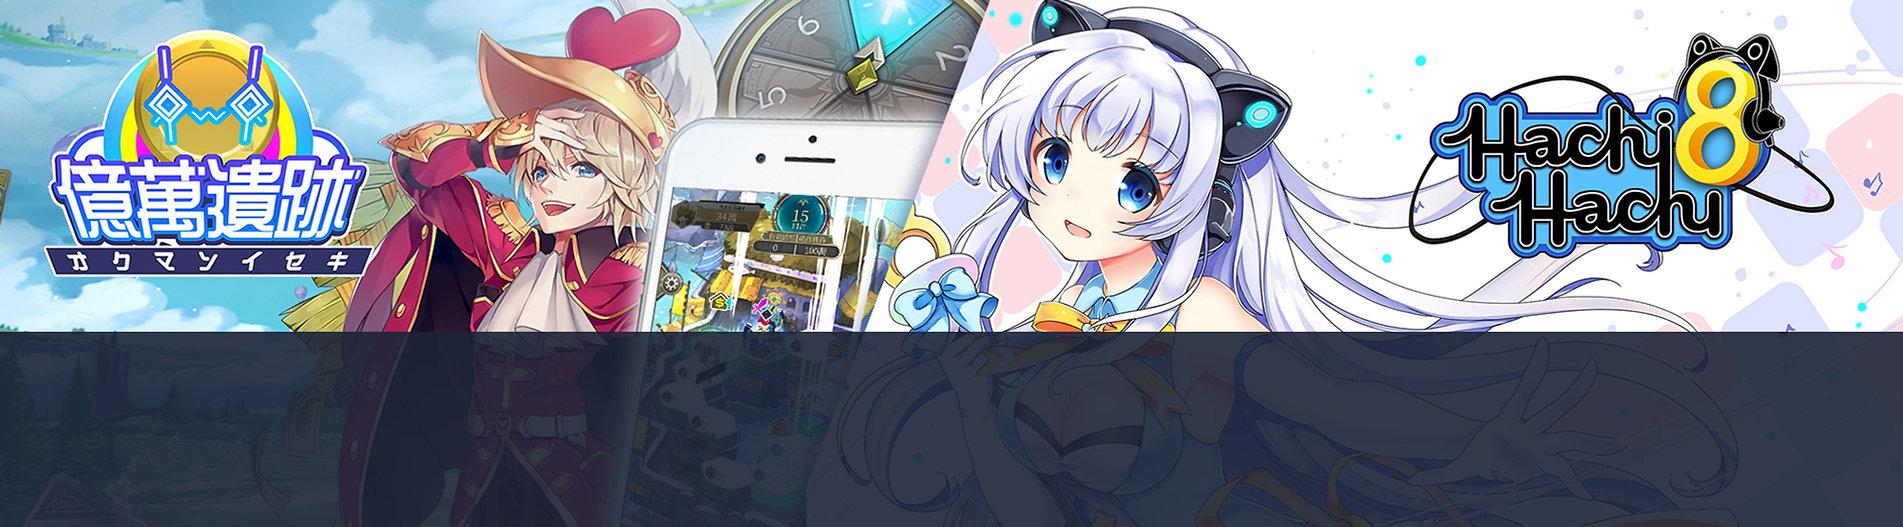 web_banner03 (1).jpg